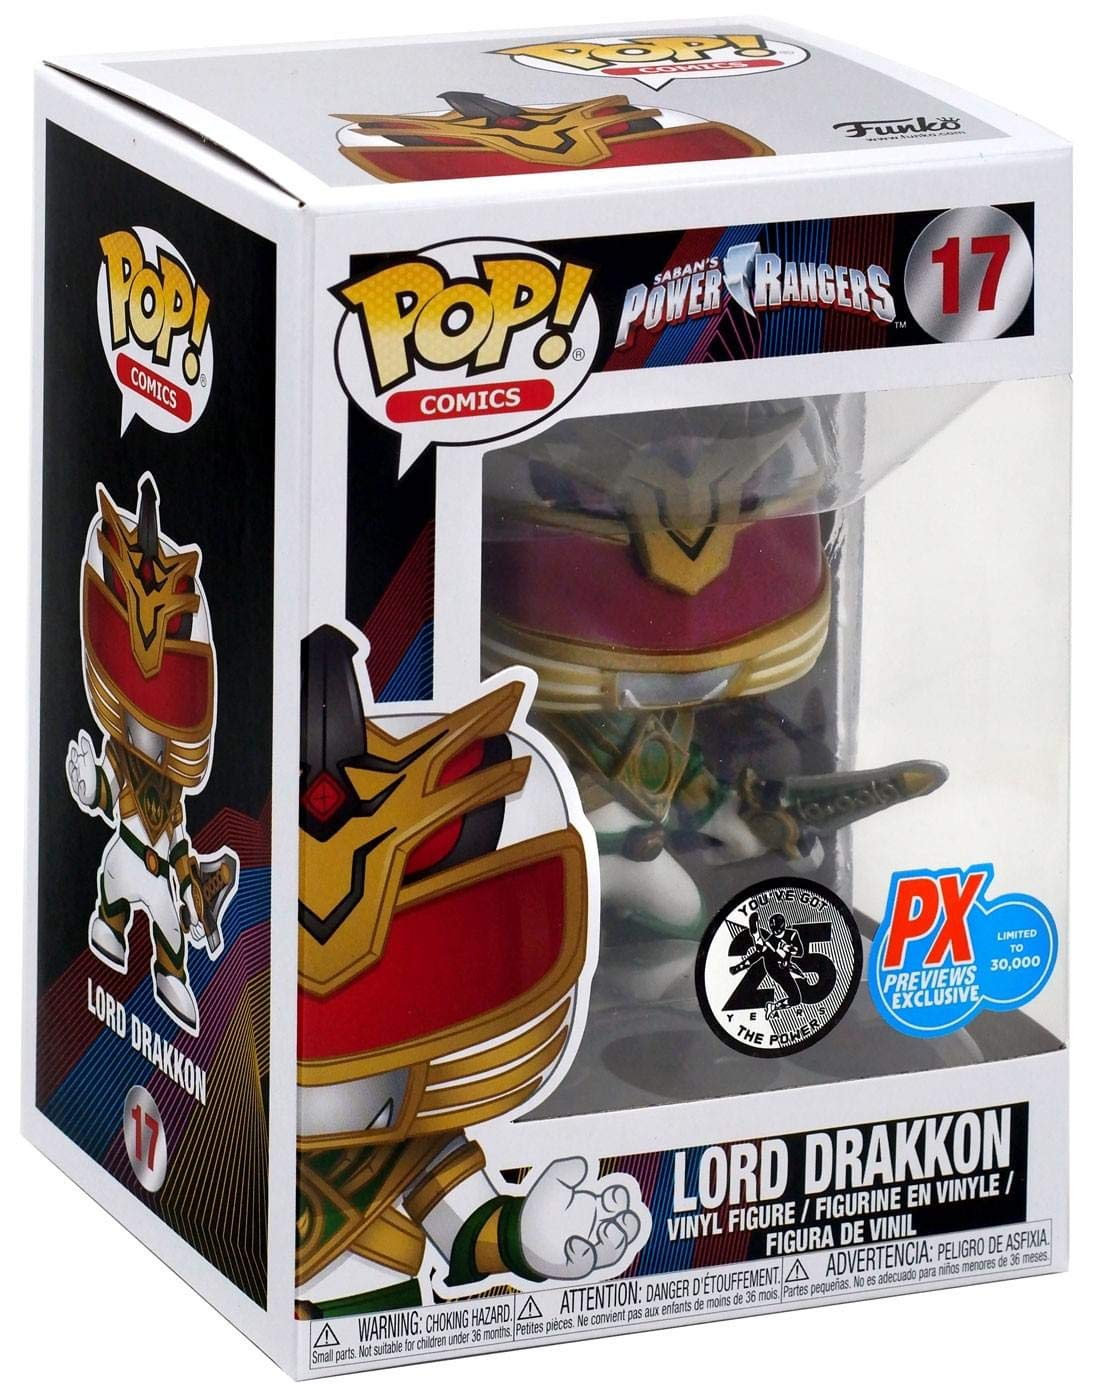 Power Rangers #17 Funko Pop! Lord Drakkon #17 Rangers (PX Previews Exclusive) 32f8cc